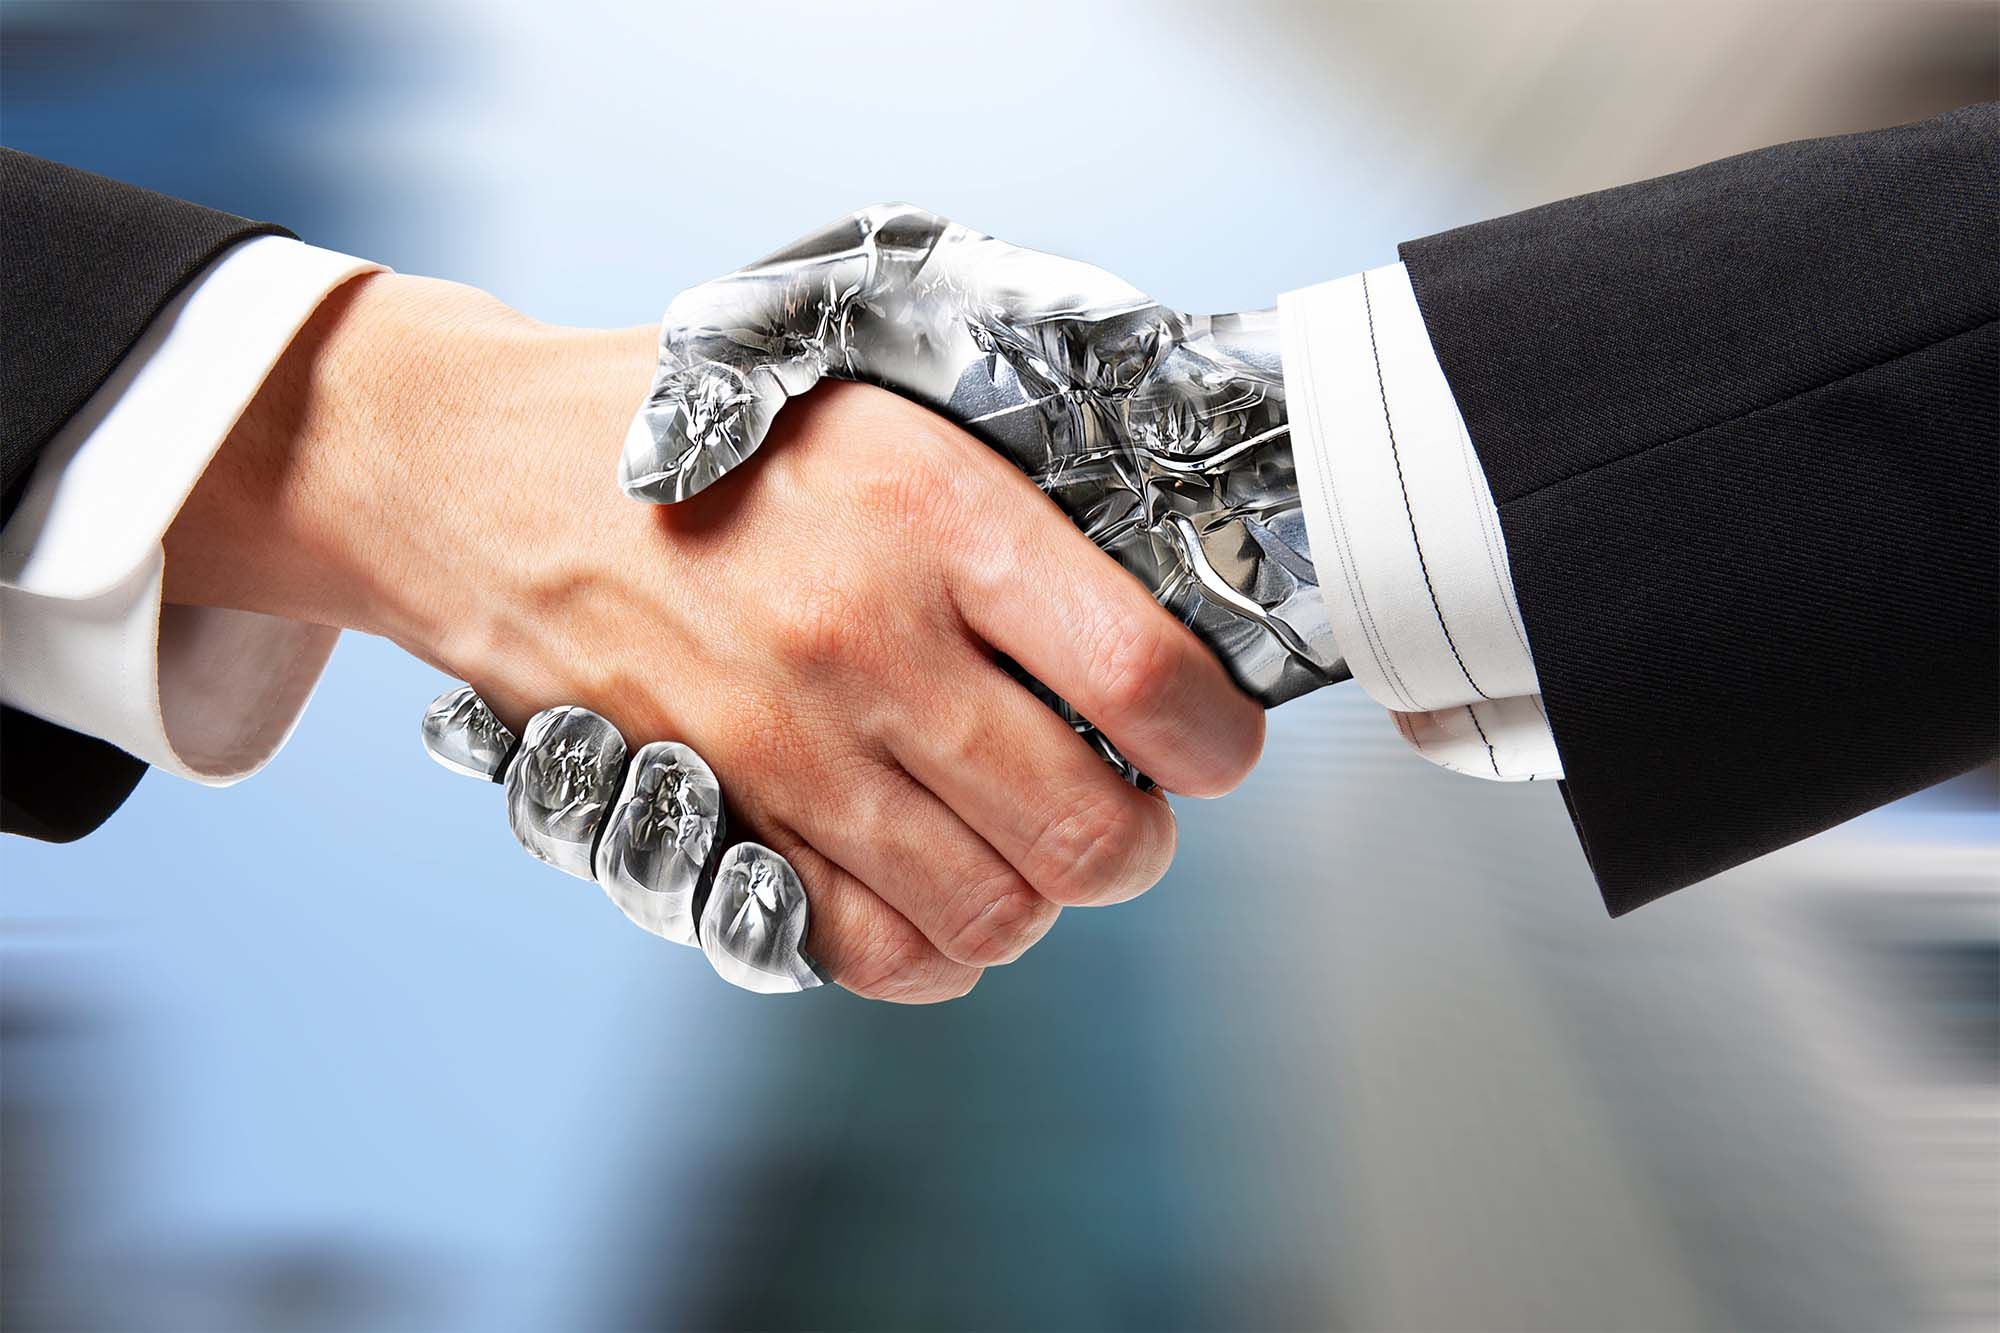 Human hand shaking robotic hand